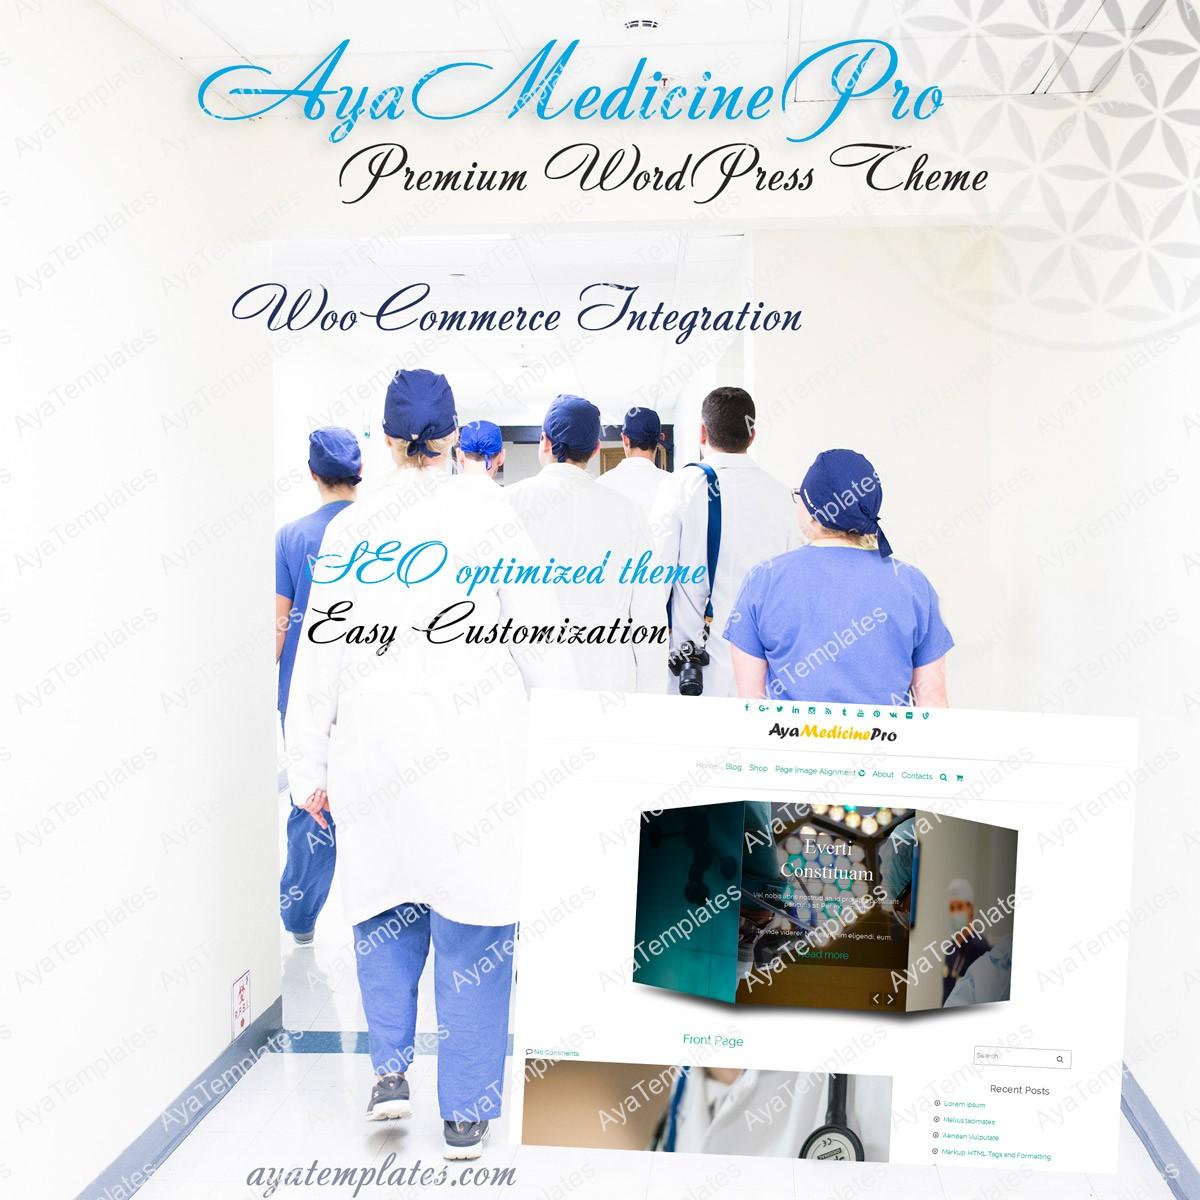 ayamedicinepro-premium-wordpress-theme-mockup-ayatemplates-com